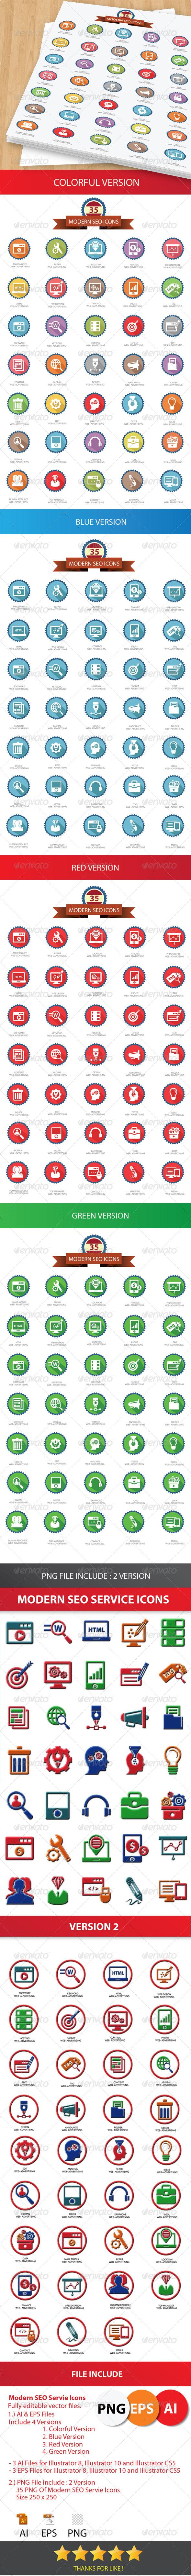 35 Modern SEO Icons - Icons